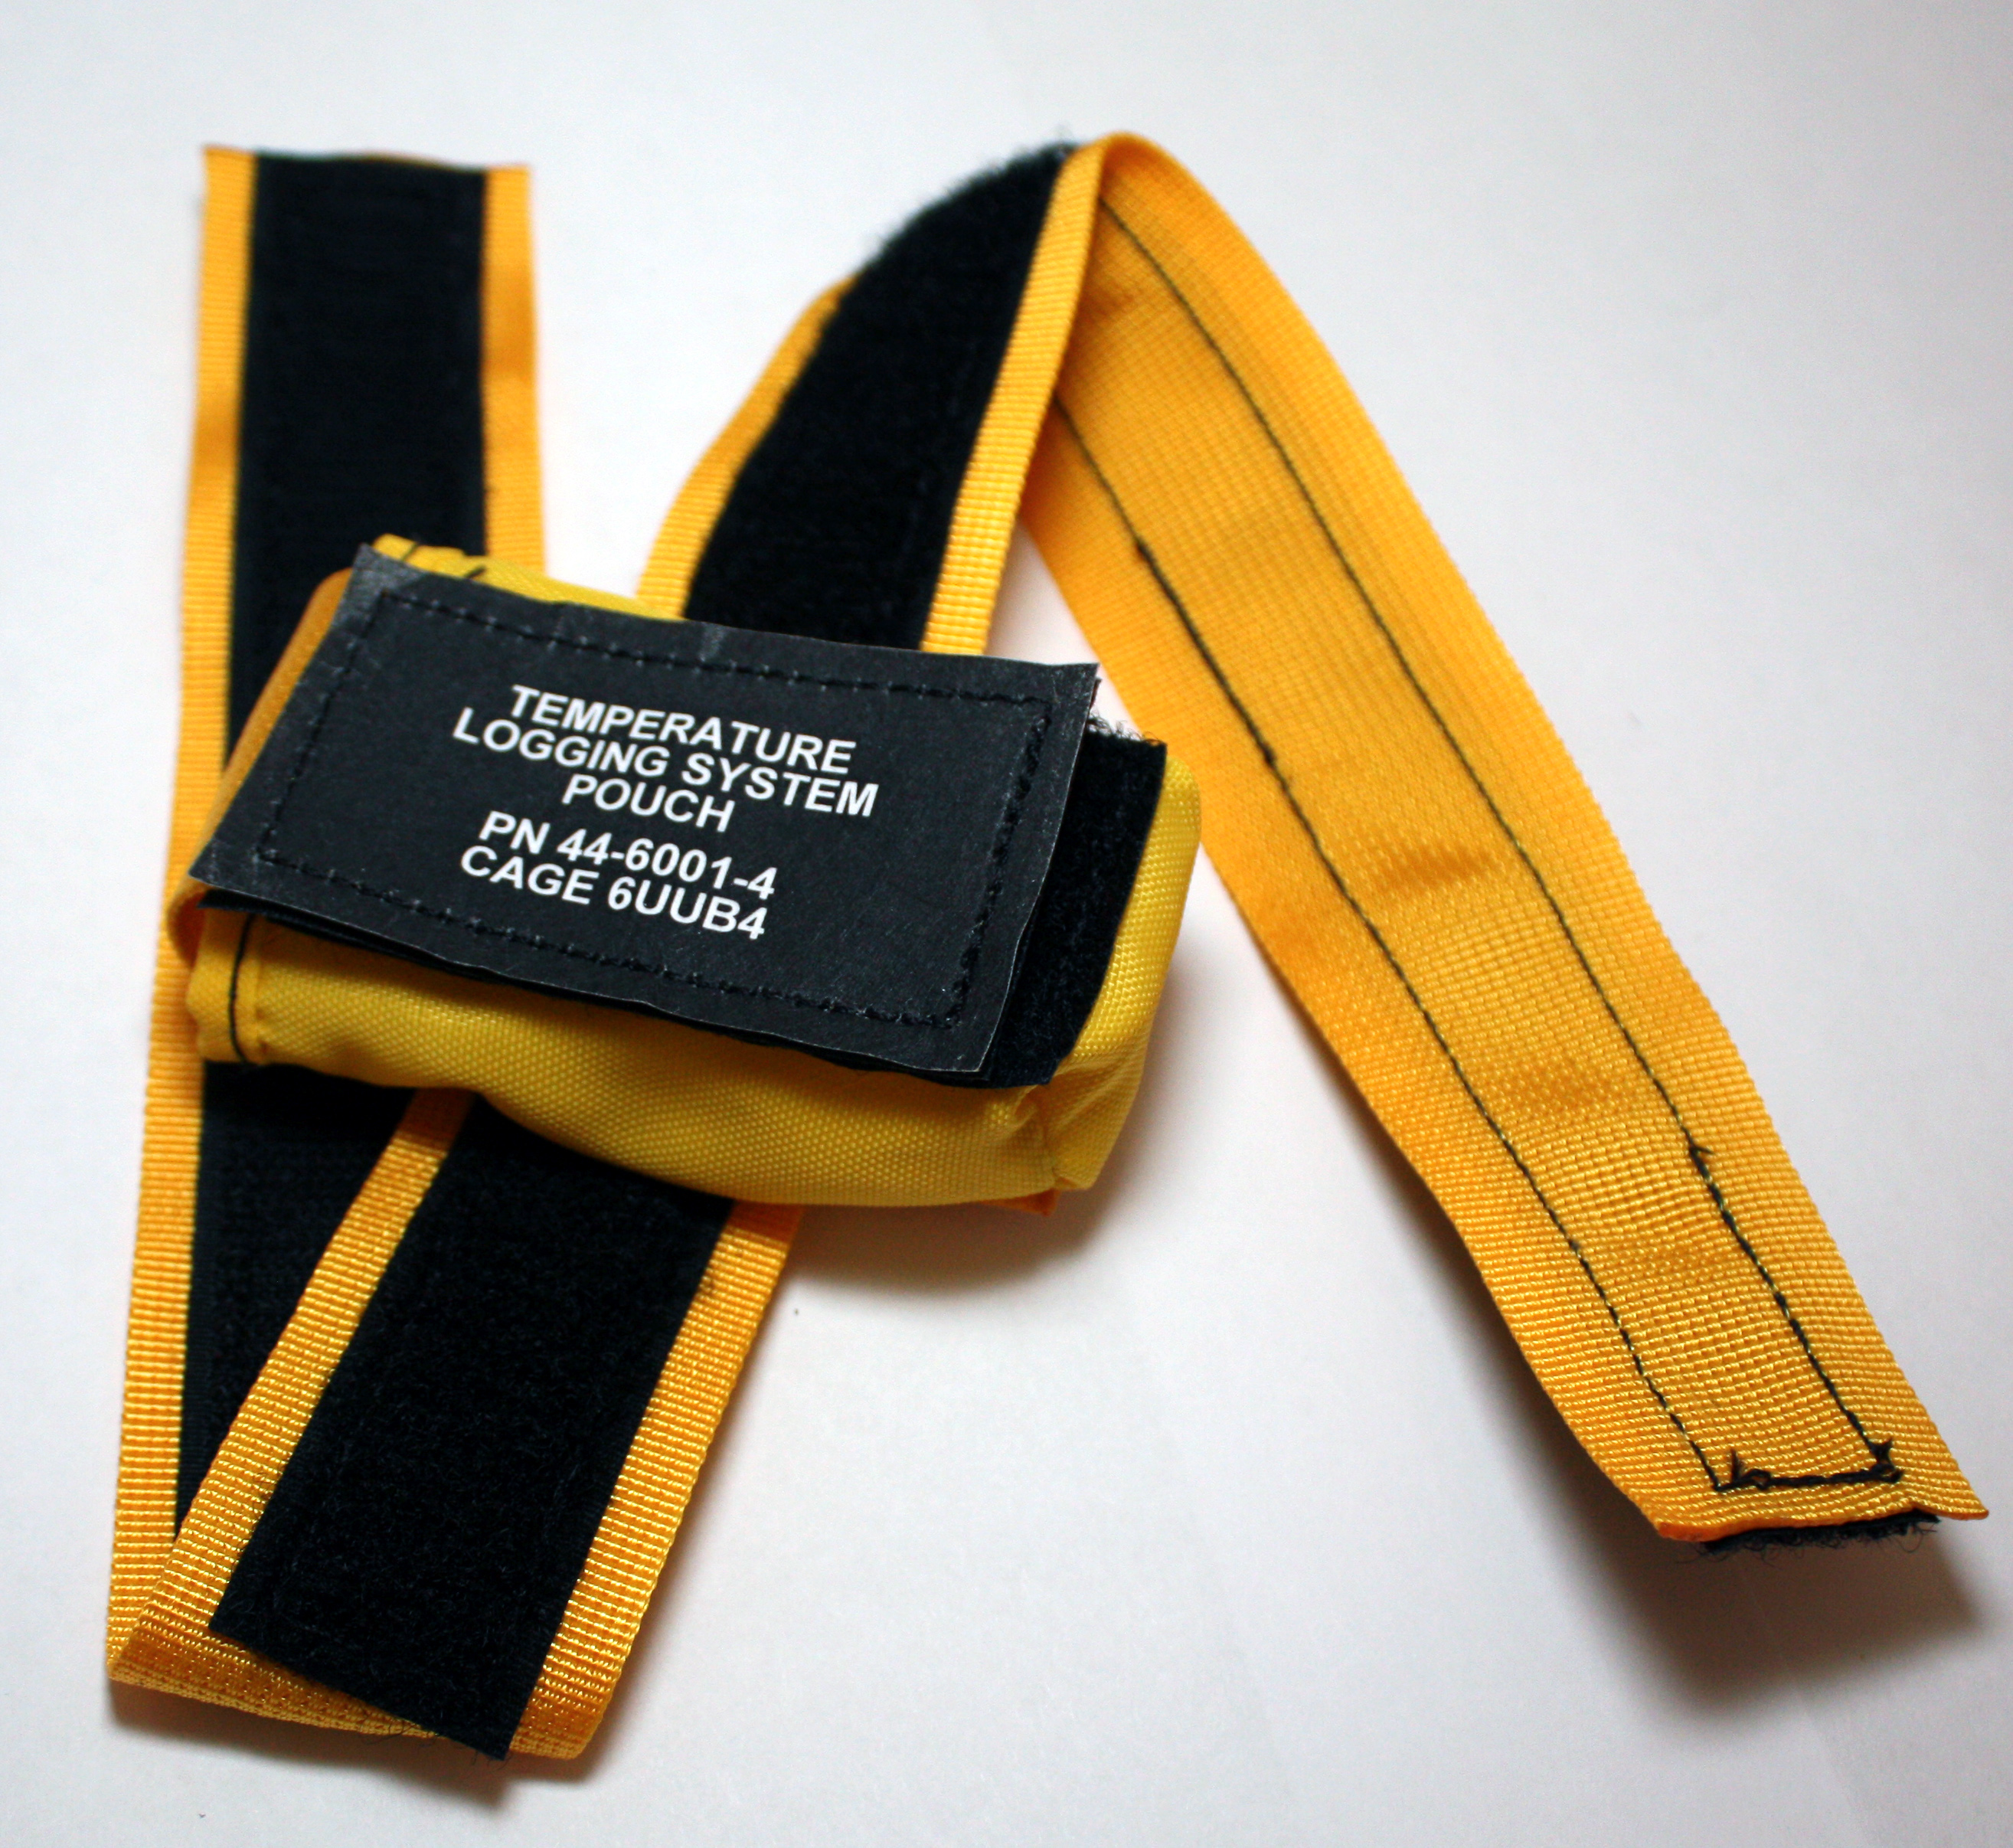 TLS pouch